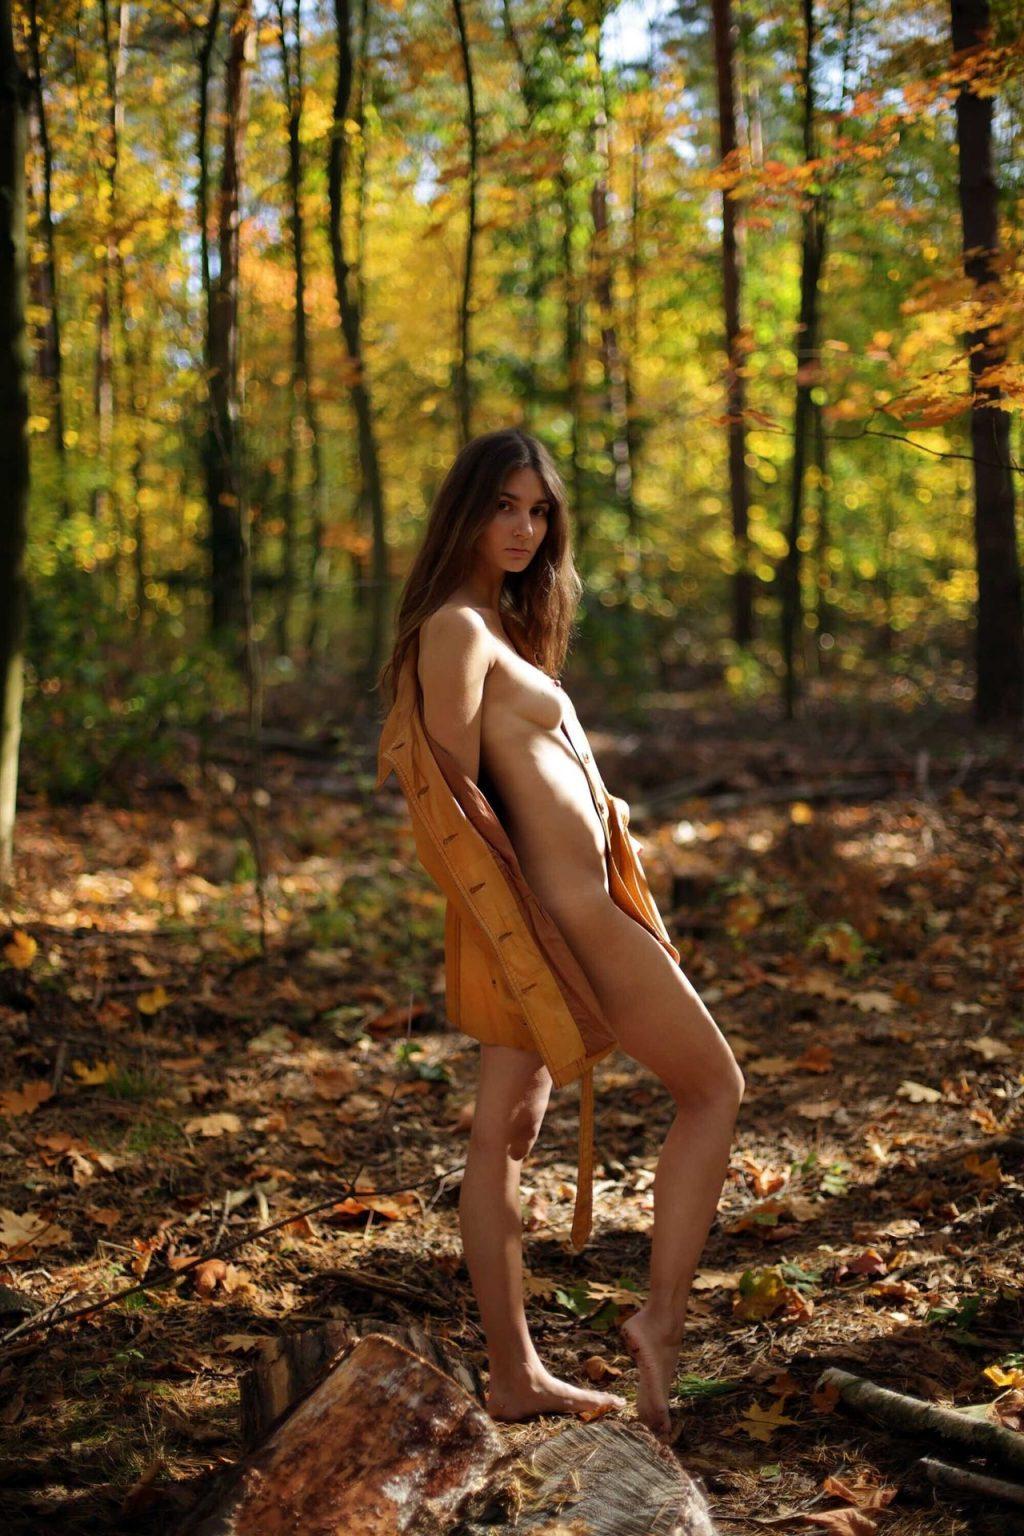 Lina-Lorenza-Nude-Sexy-The-Fappening-Blog-com-16-1024x1536